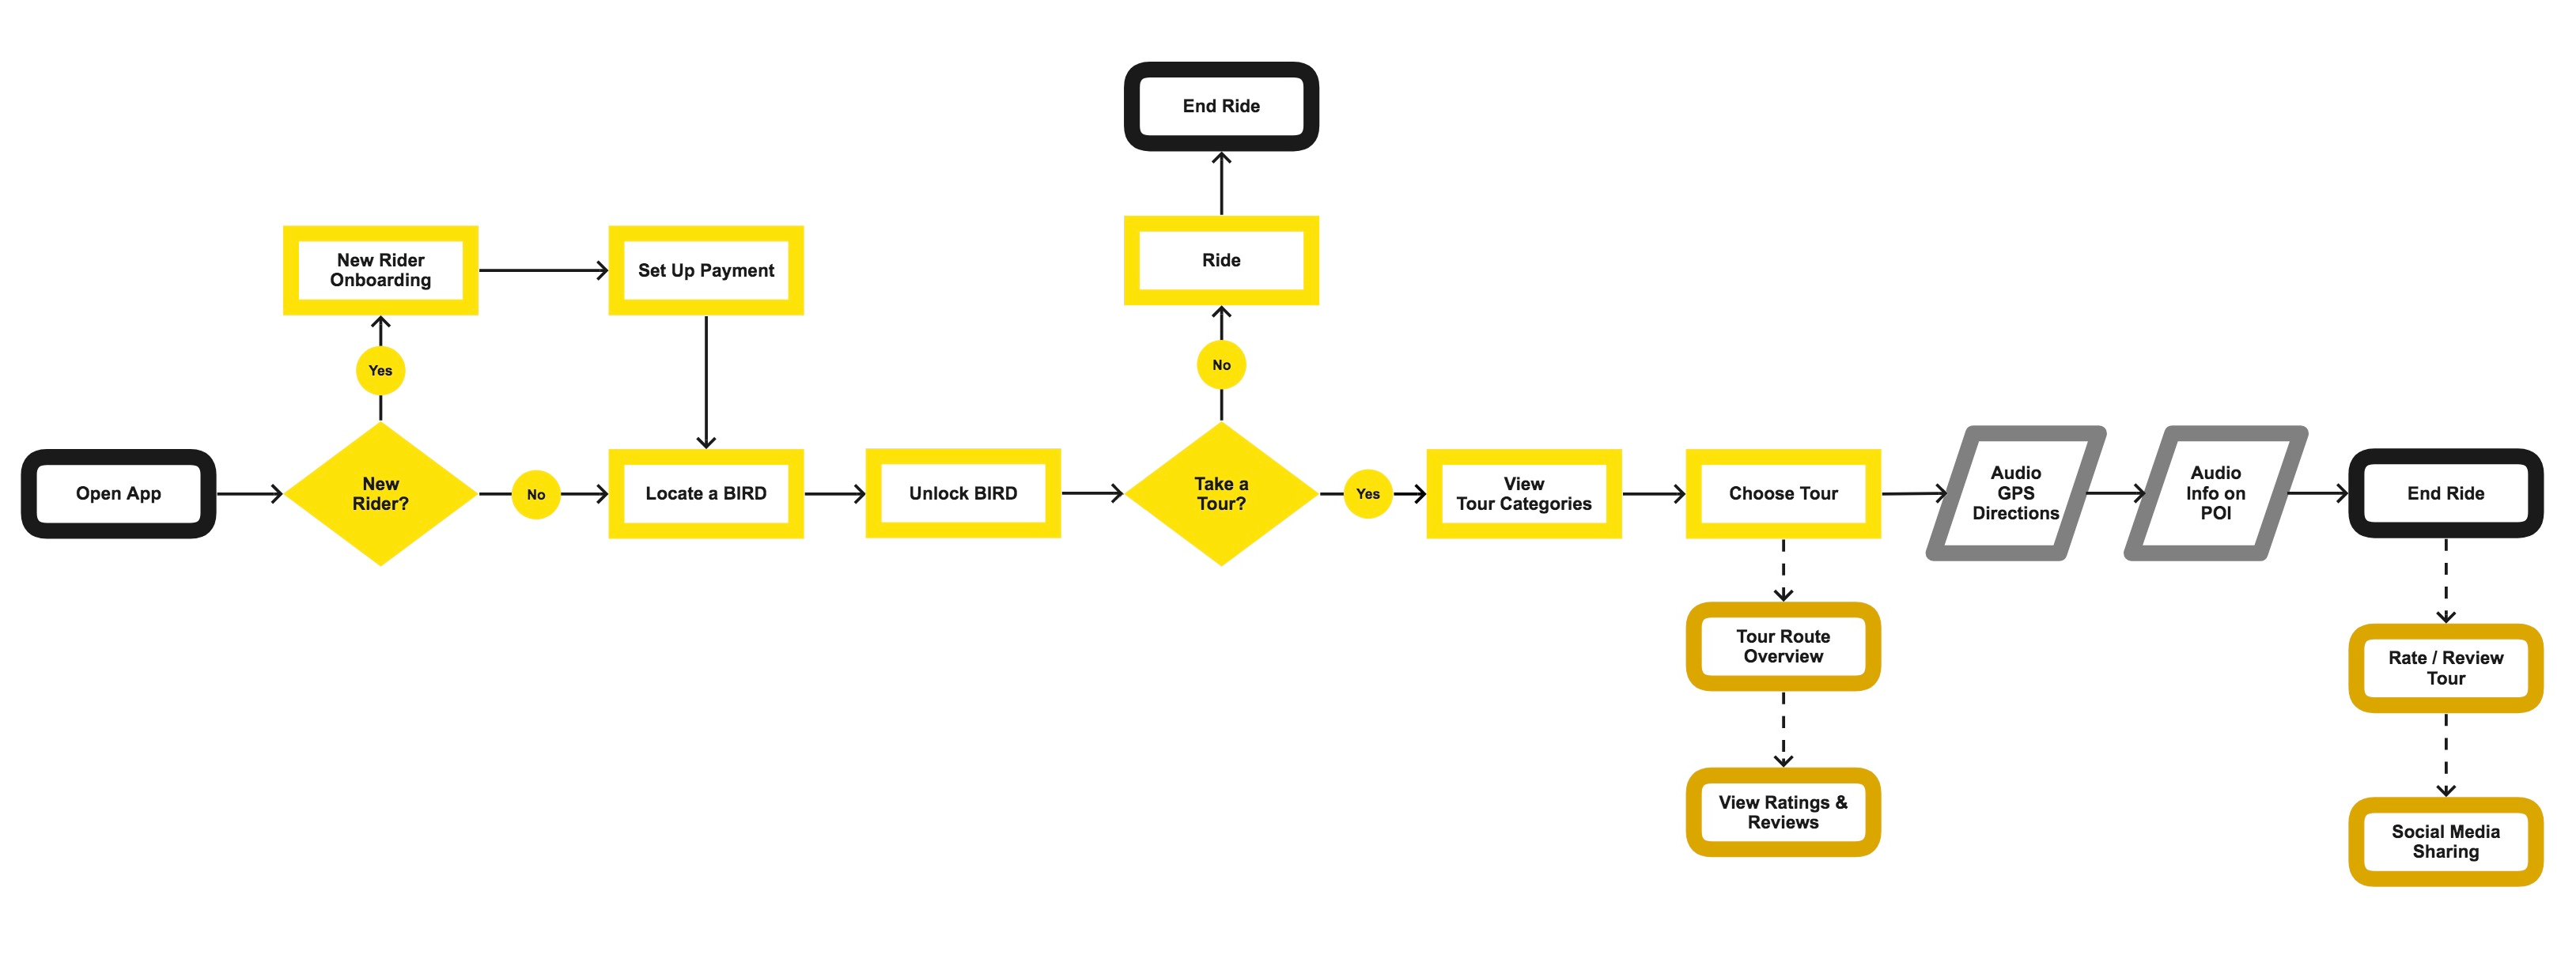 Goldfinch tour user flow